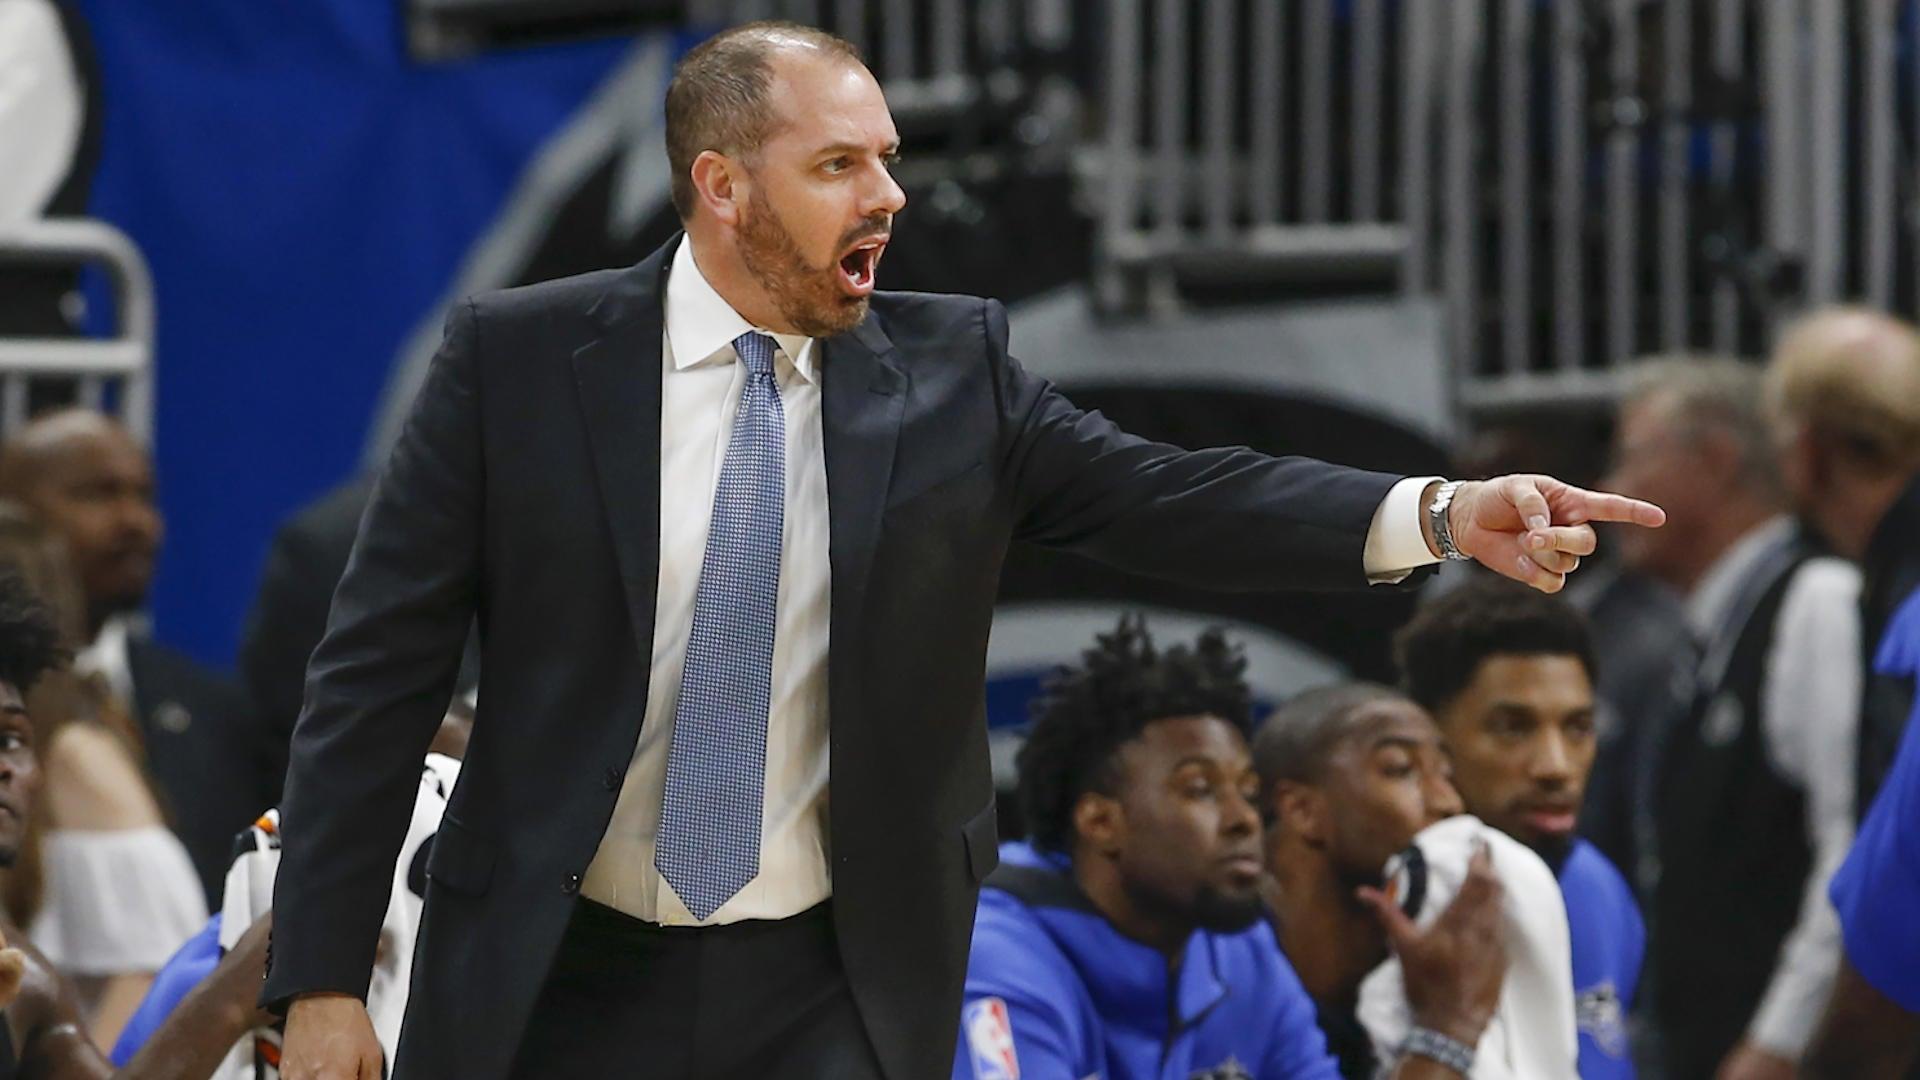 Magic fire coach Frank Vogel after 2 seasons - CBSSports.com